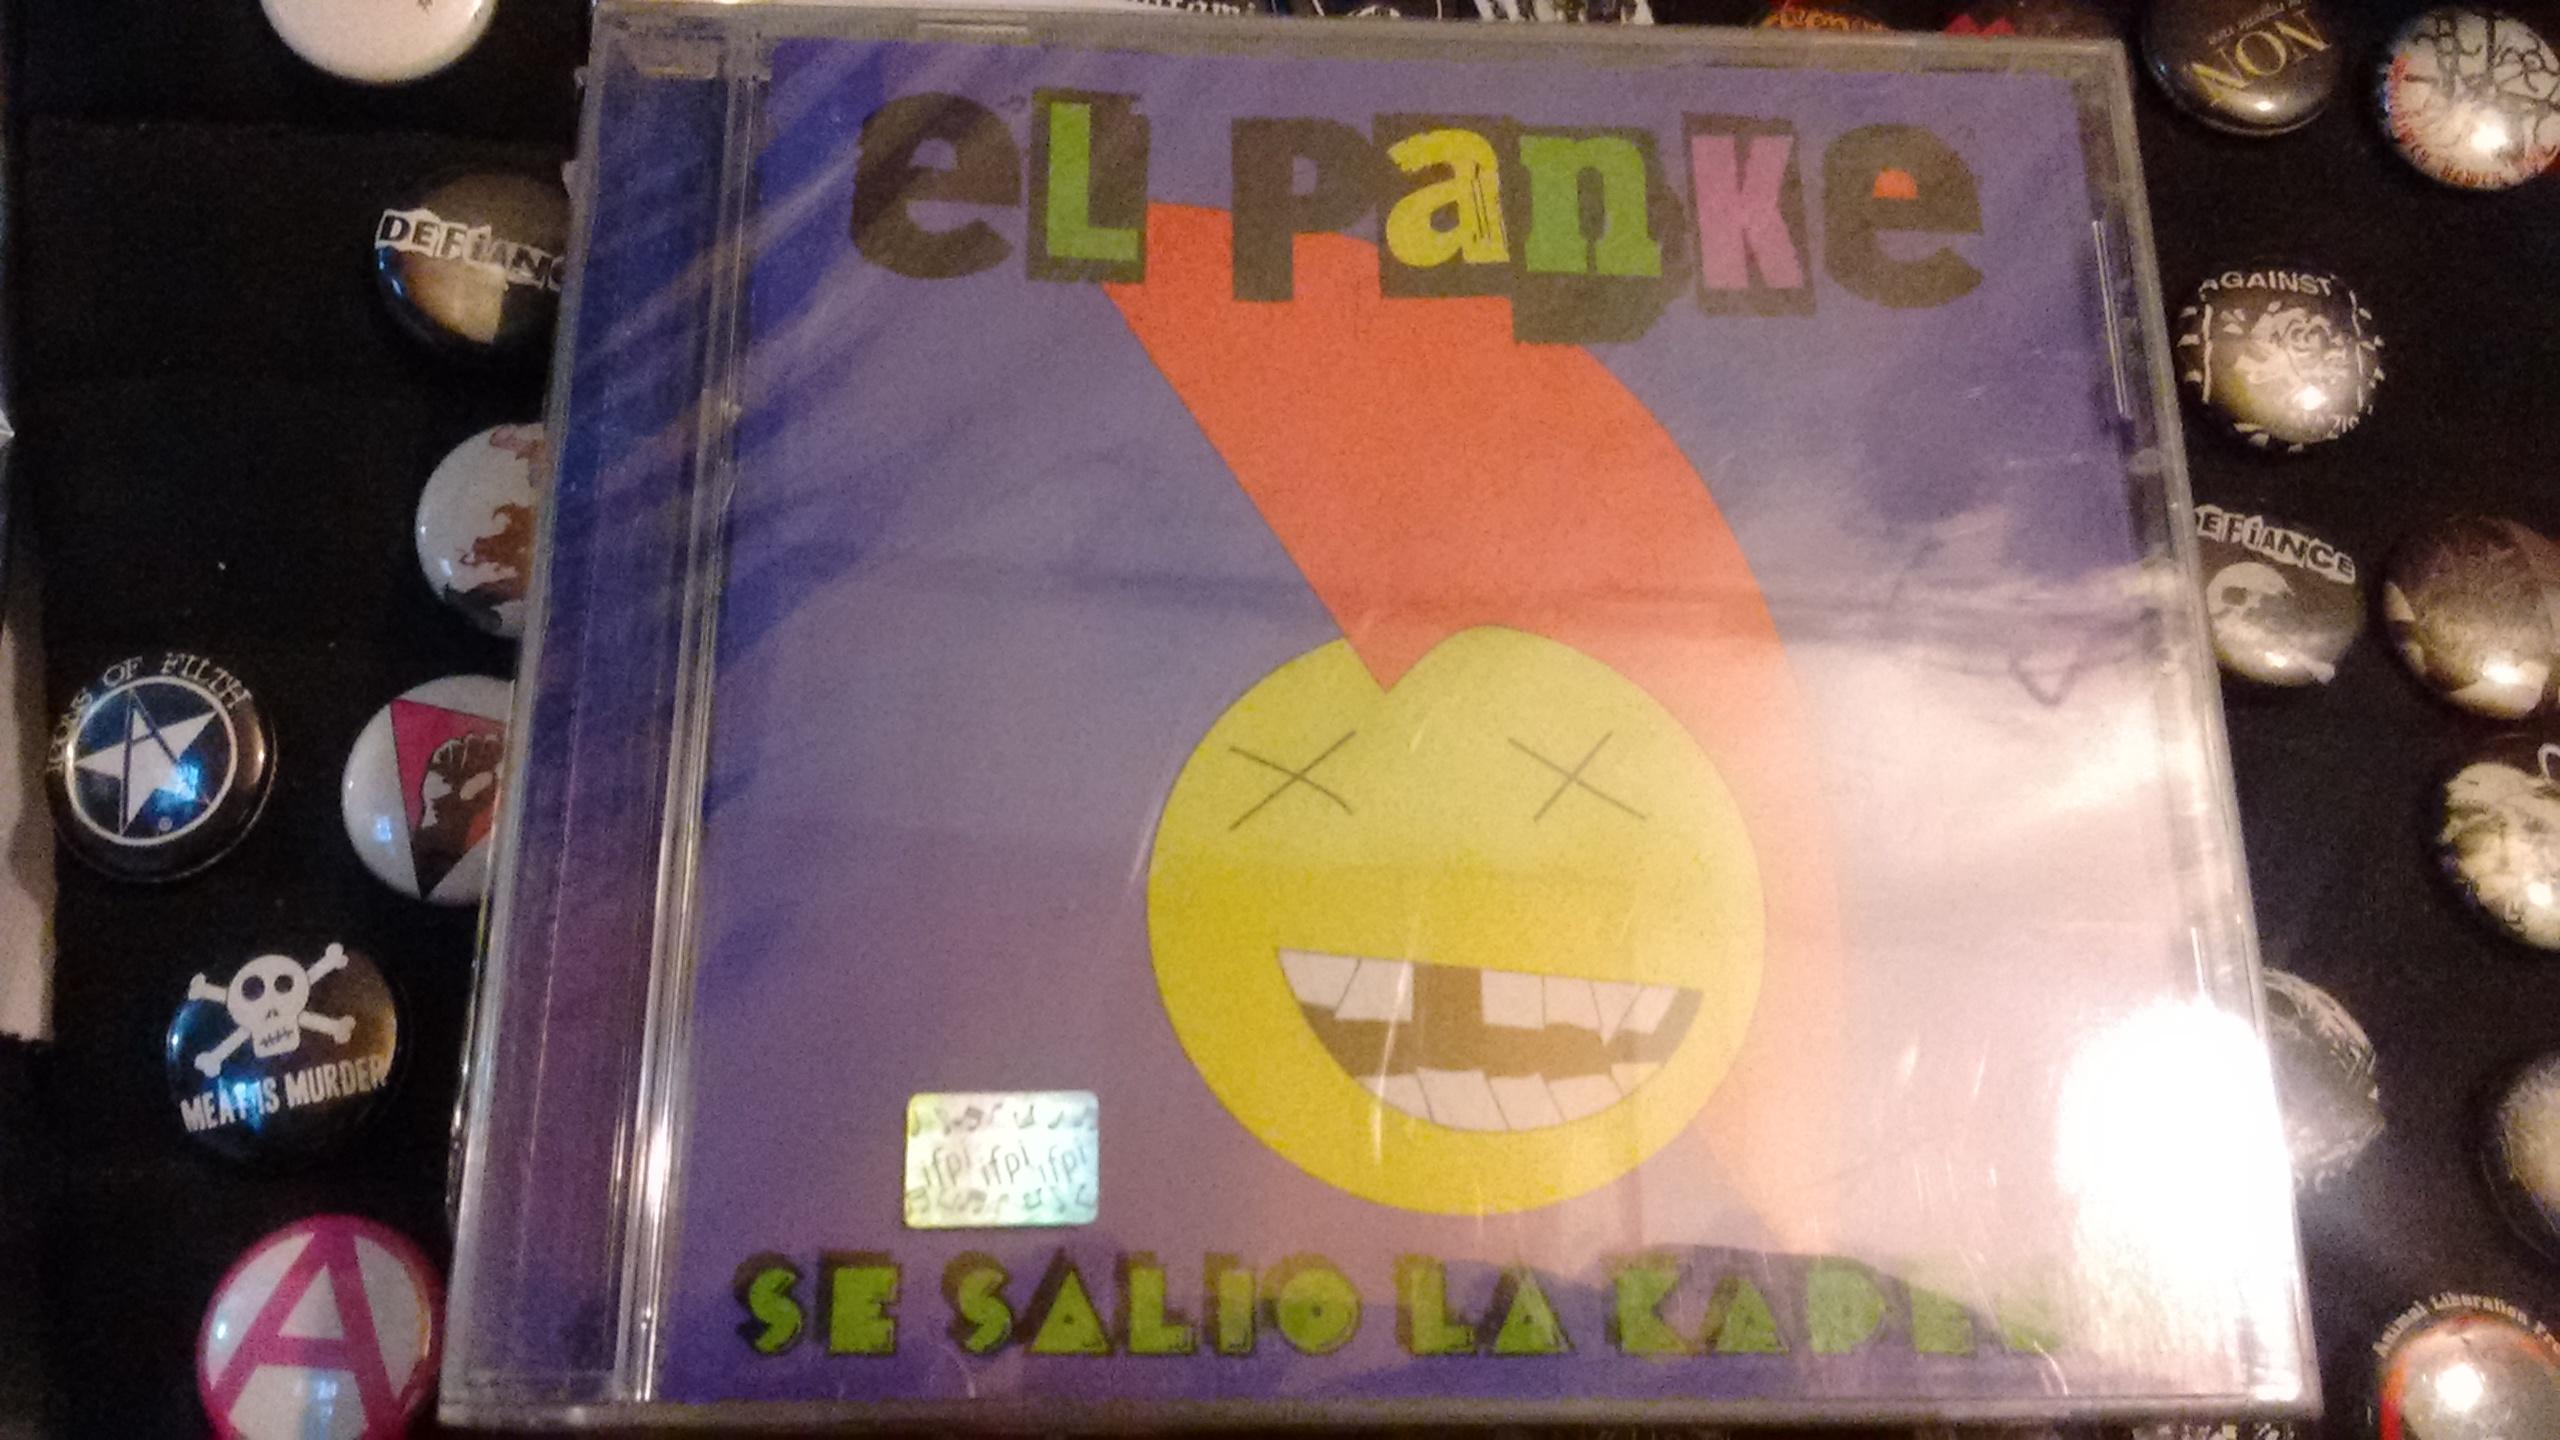 El Panke Image